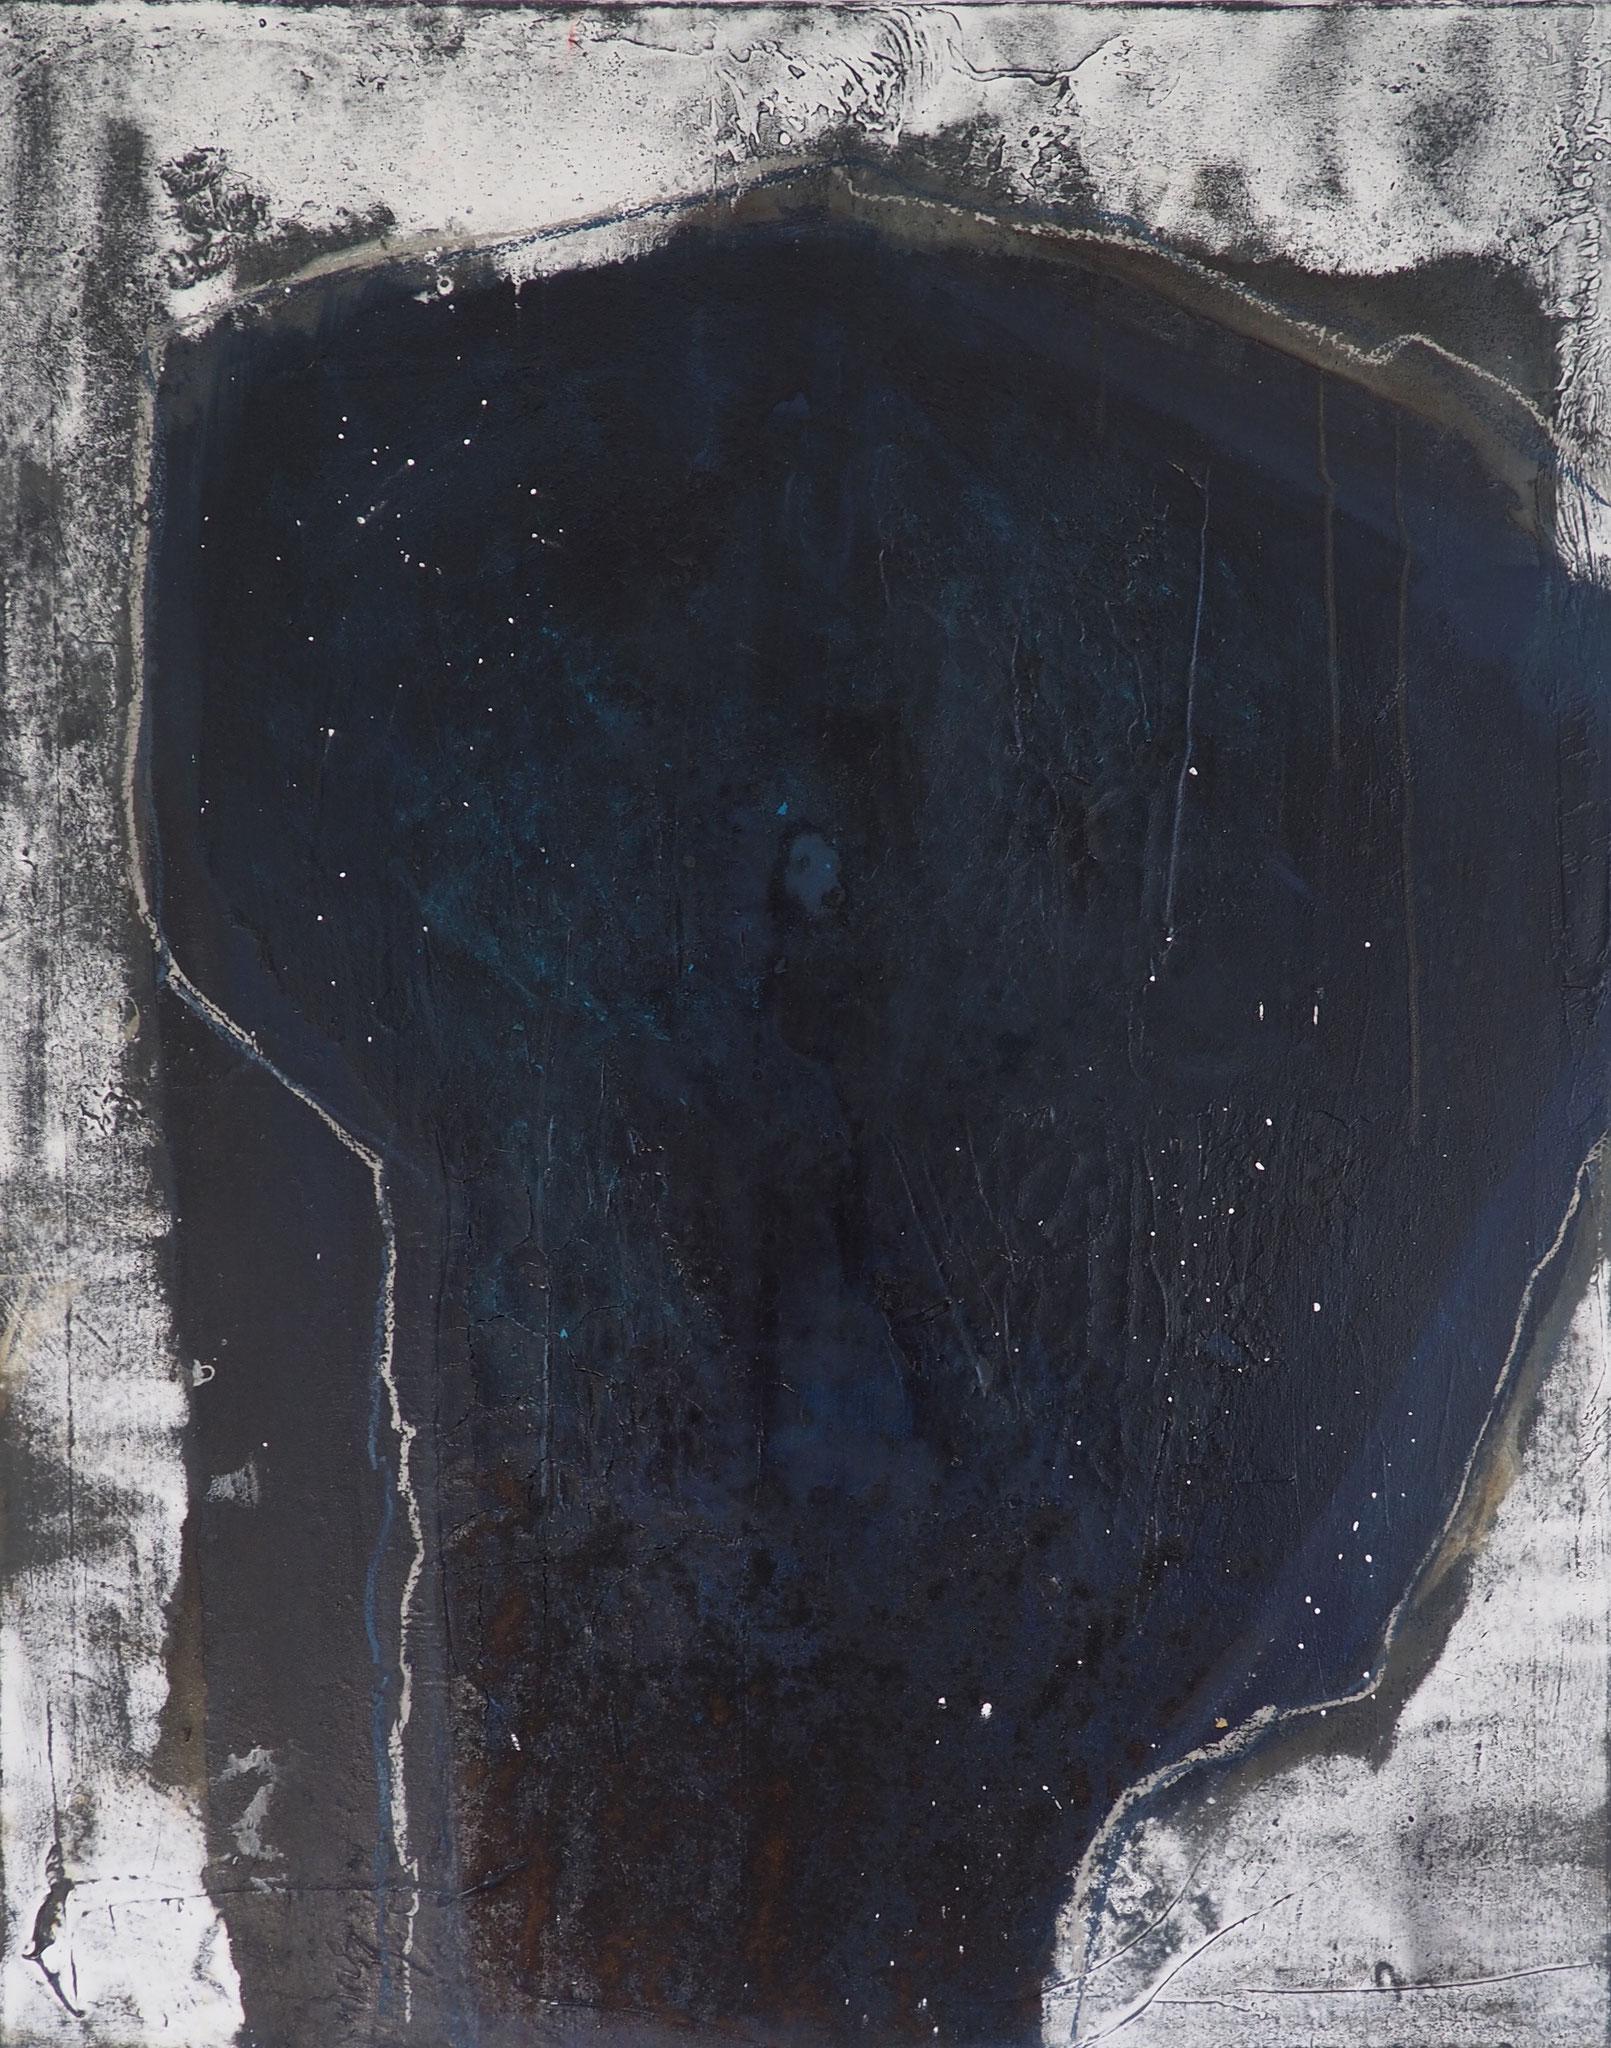 Blauer Kaffee - 80 x 100 cm, Acryl-Mischtechnik